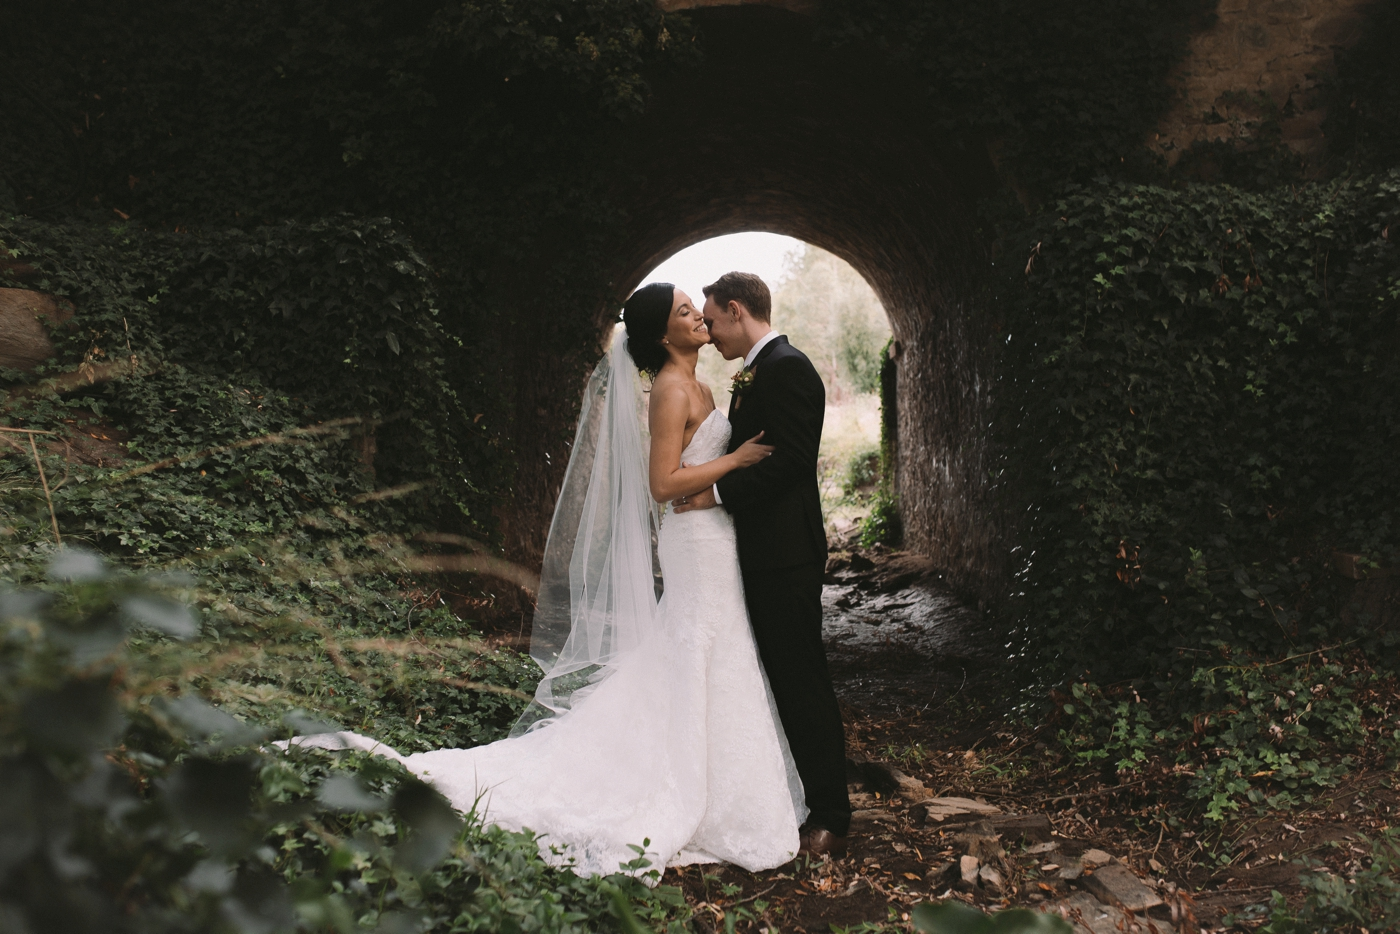 Jasmine and Adam - Inglewood Inn Wedding Photography - Natural Wedding Photographer in Adelaide - www.katherineschultzphotography.com_0069.jpg